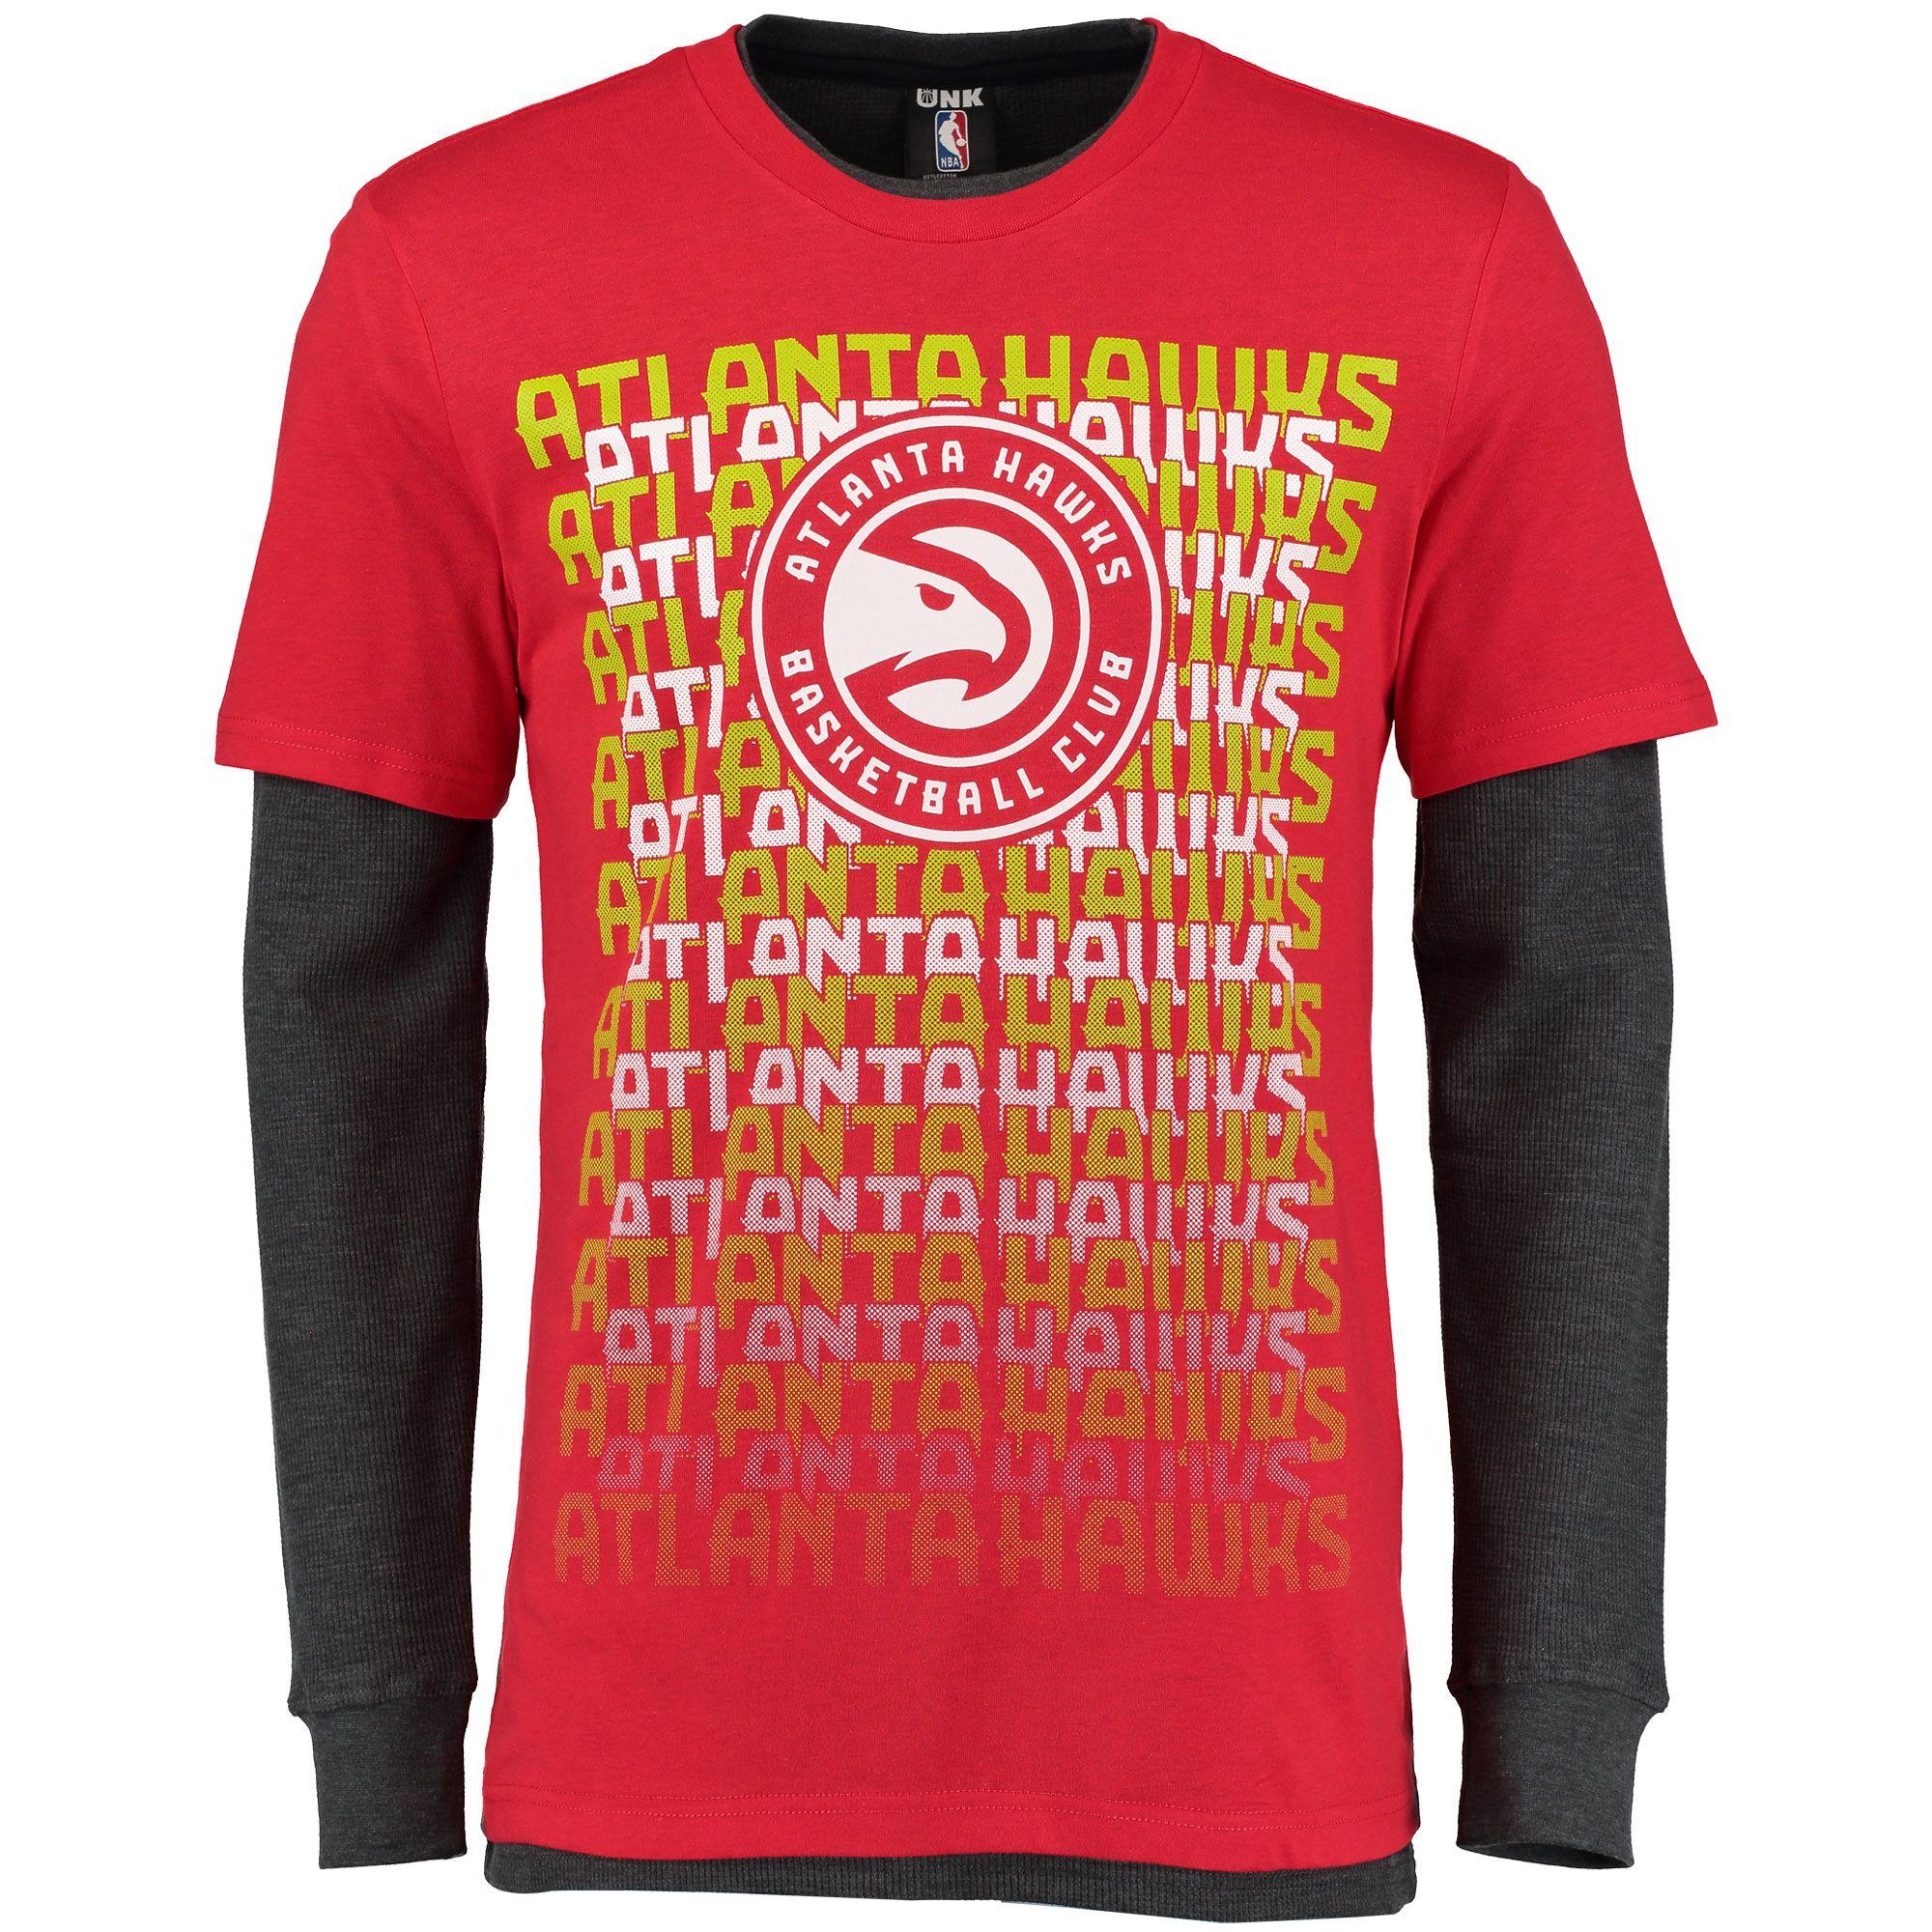 3843214eb NBA Atlanta Hawks 3-in-1 Combo T-Shirt Set - Red Charcoal